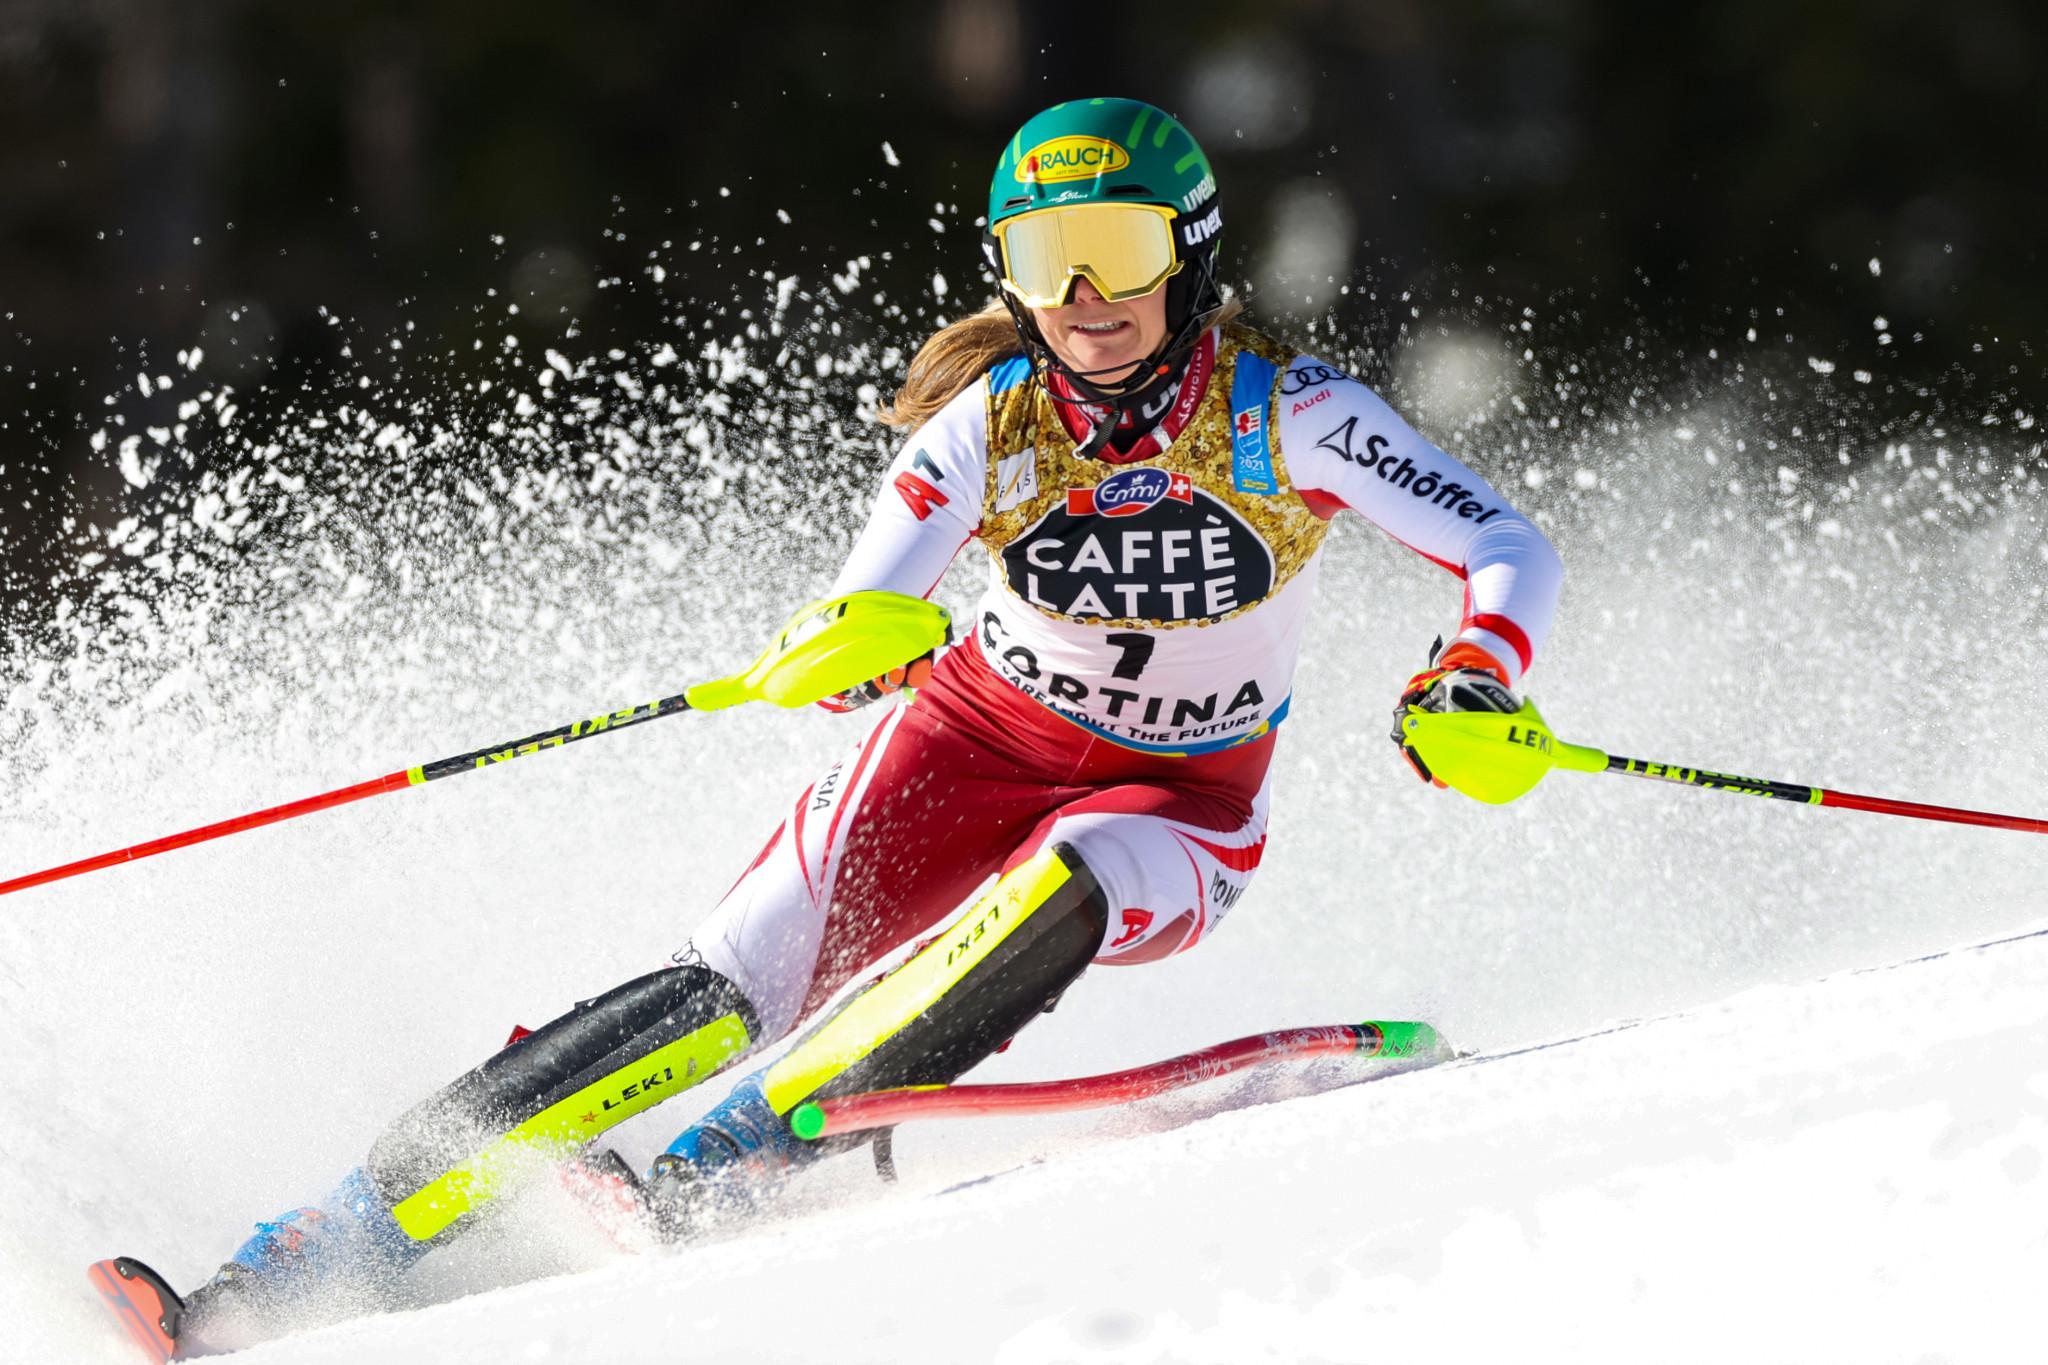 Liensberger ends Shiffrin's slalom reign at Alpine Ski World Championships